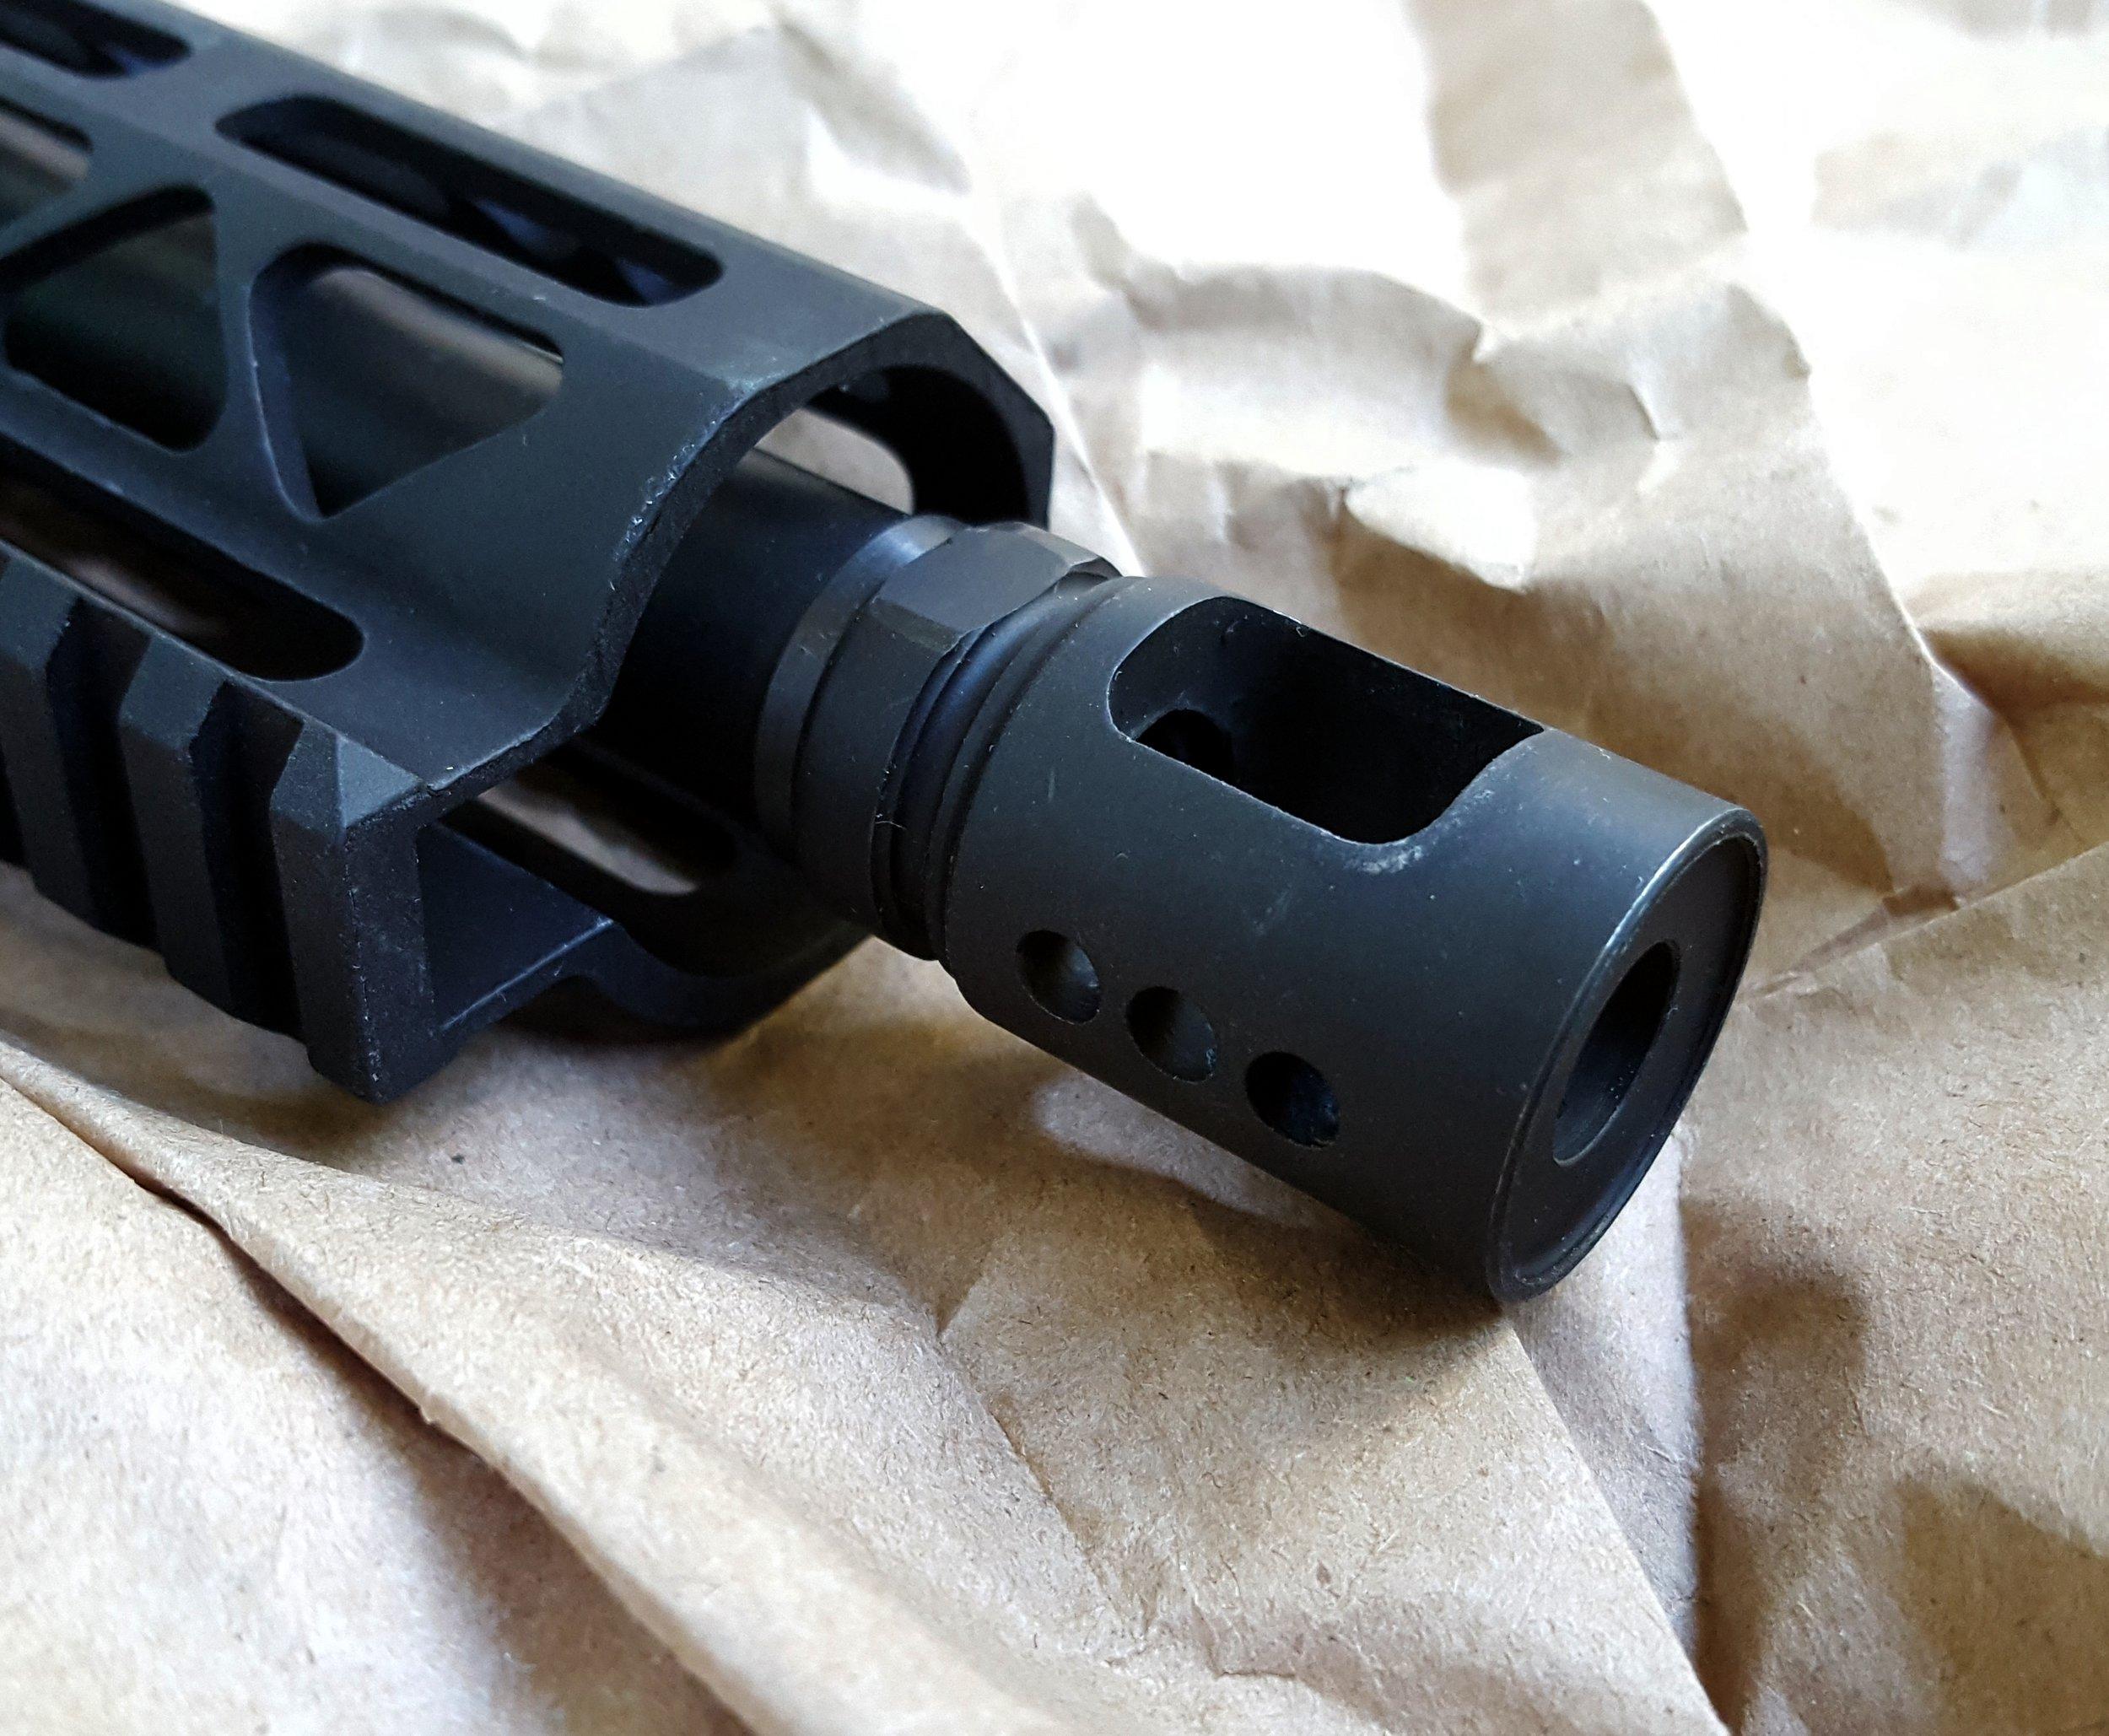 9mmcomp1.jpg